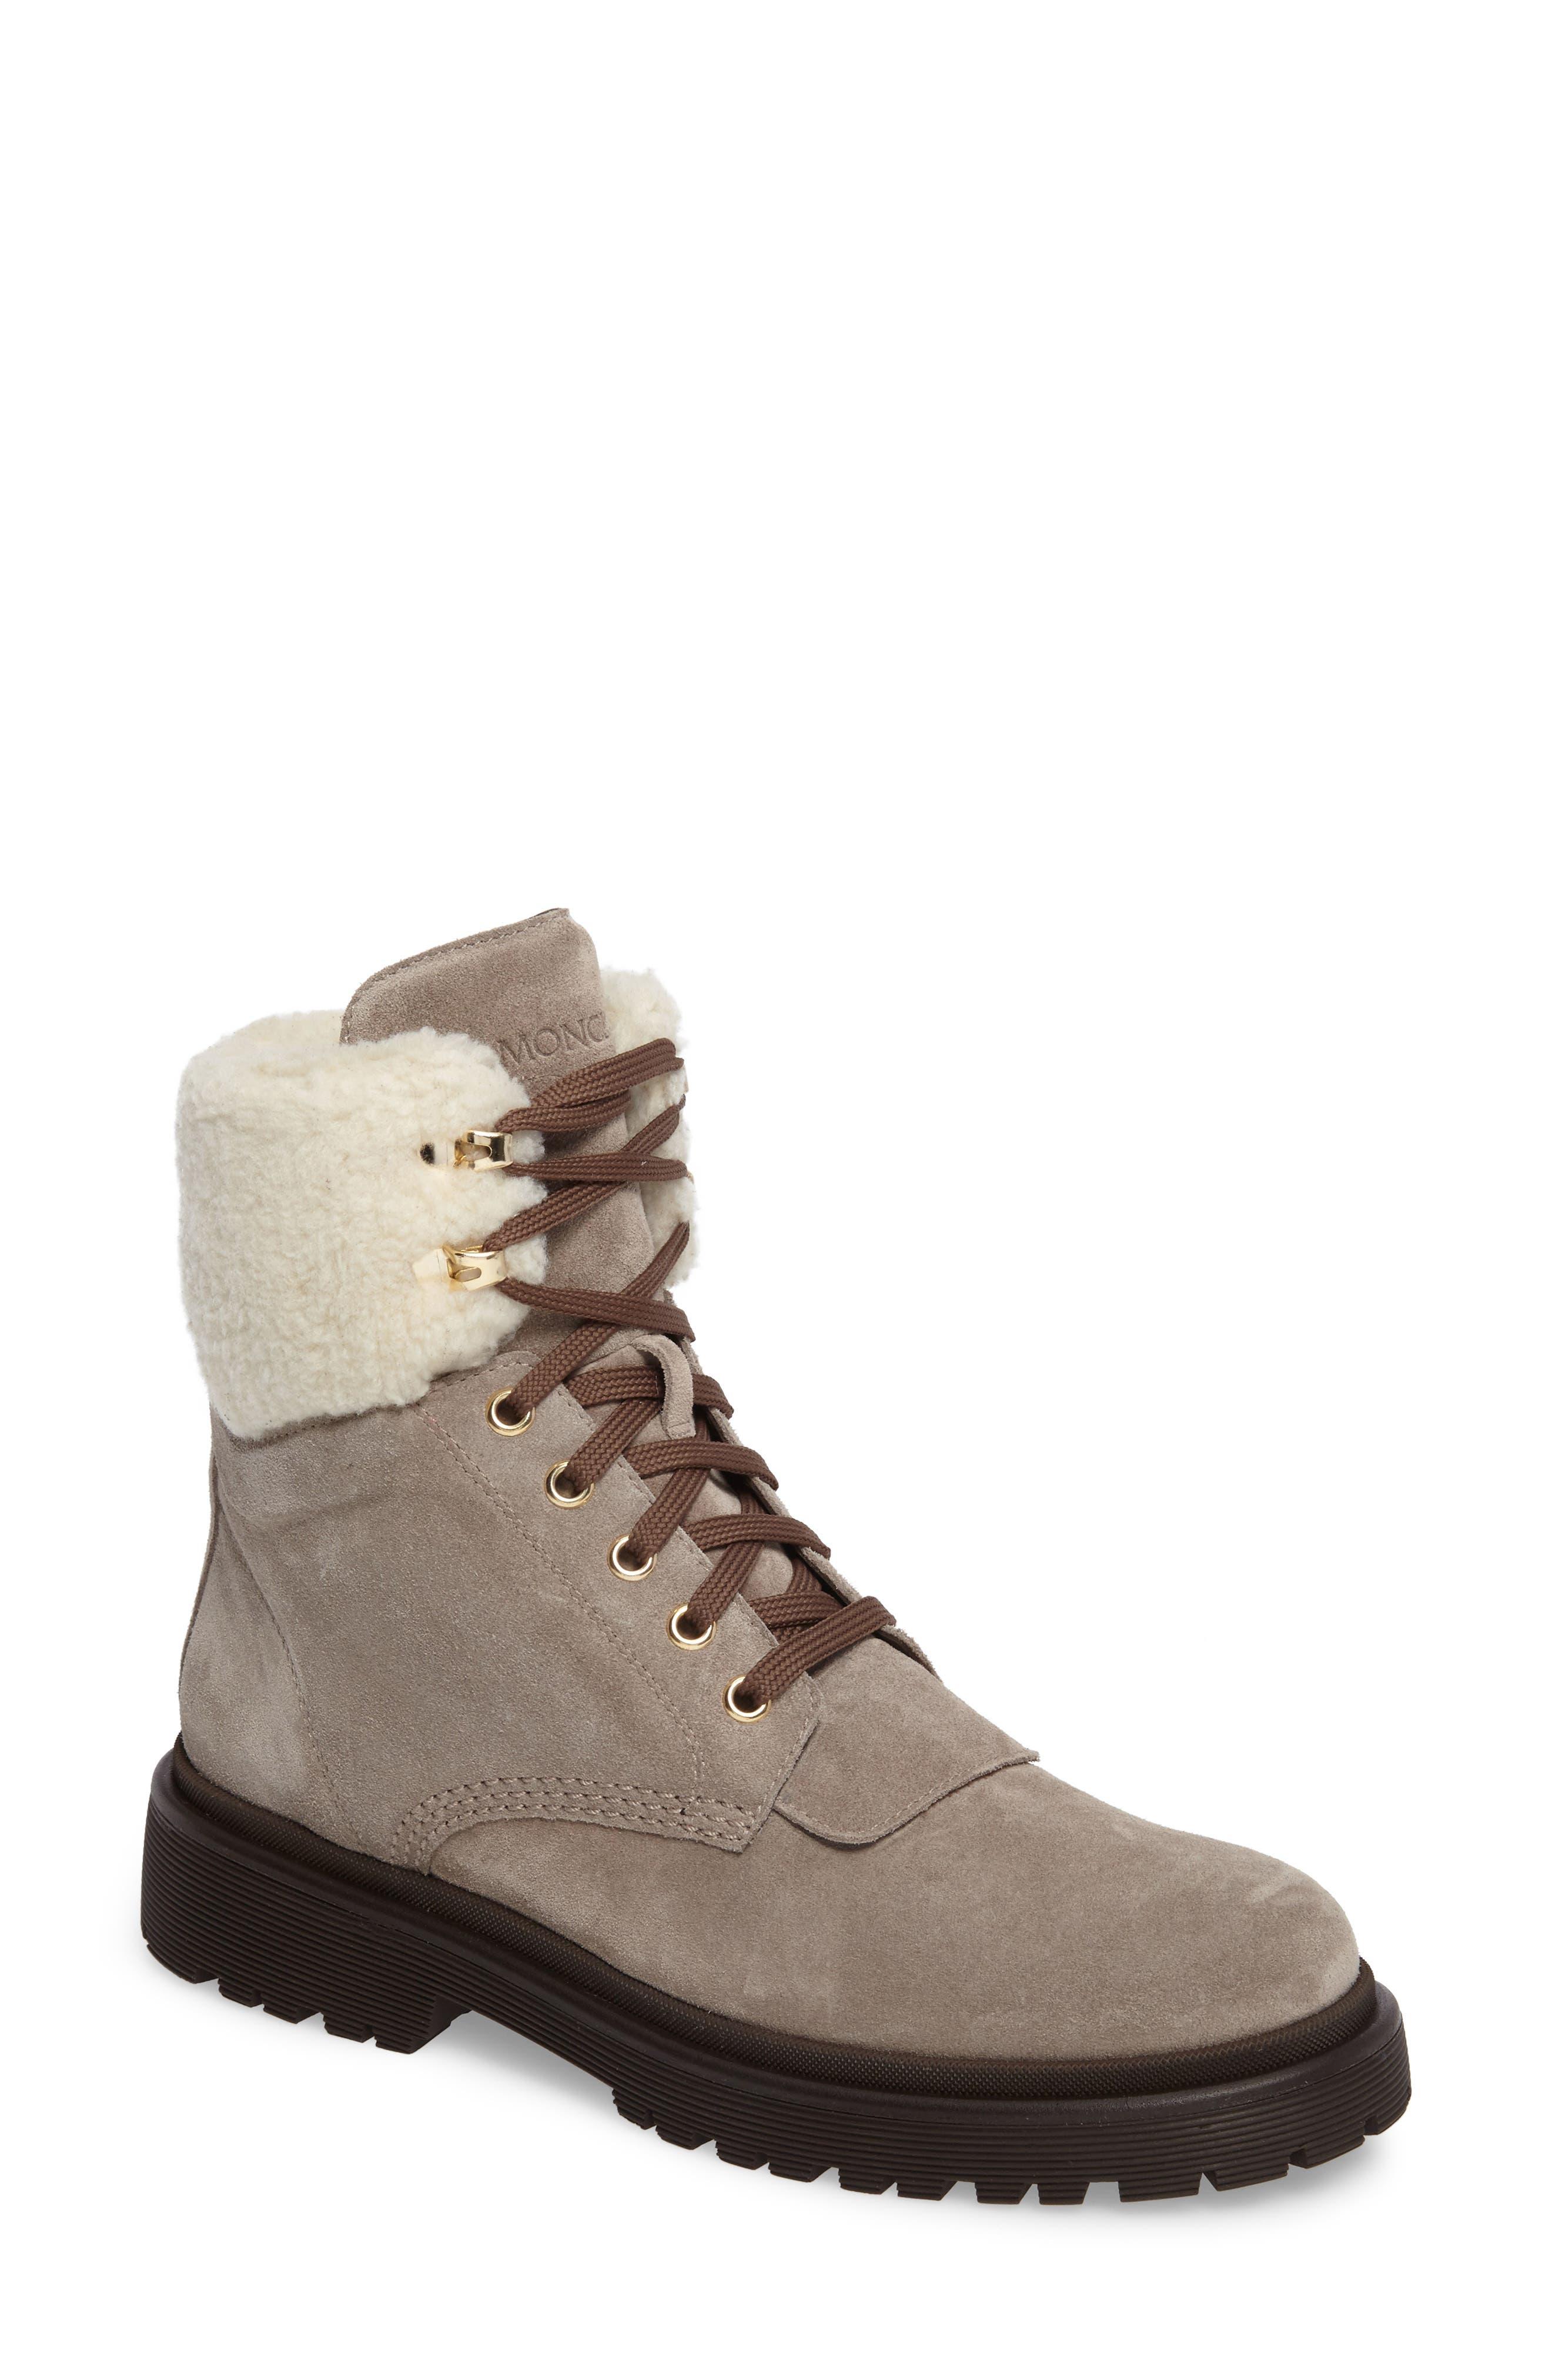 Patty Scarpa Faux Shearling Cuff Boot,                         Main,                         color, BEIGE